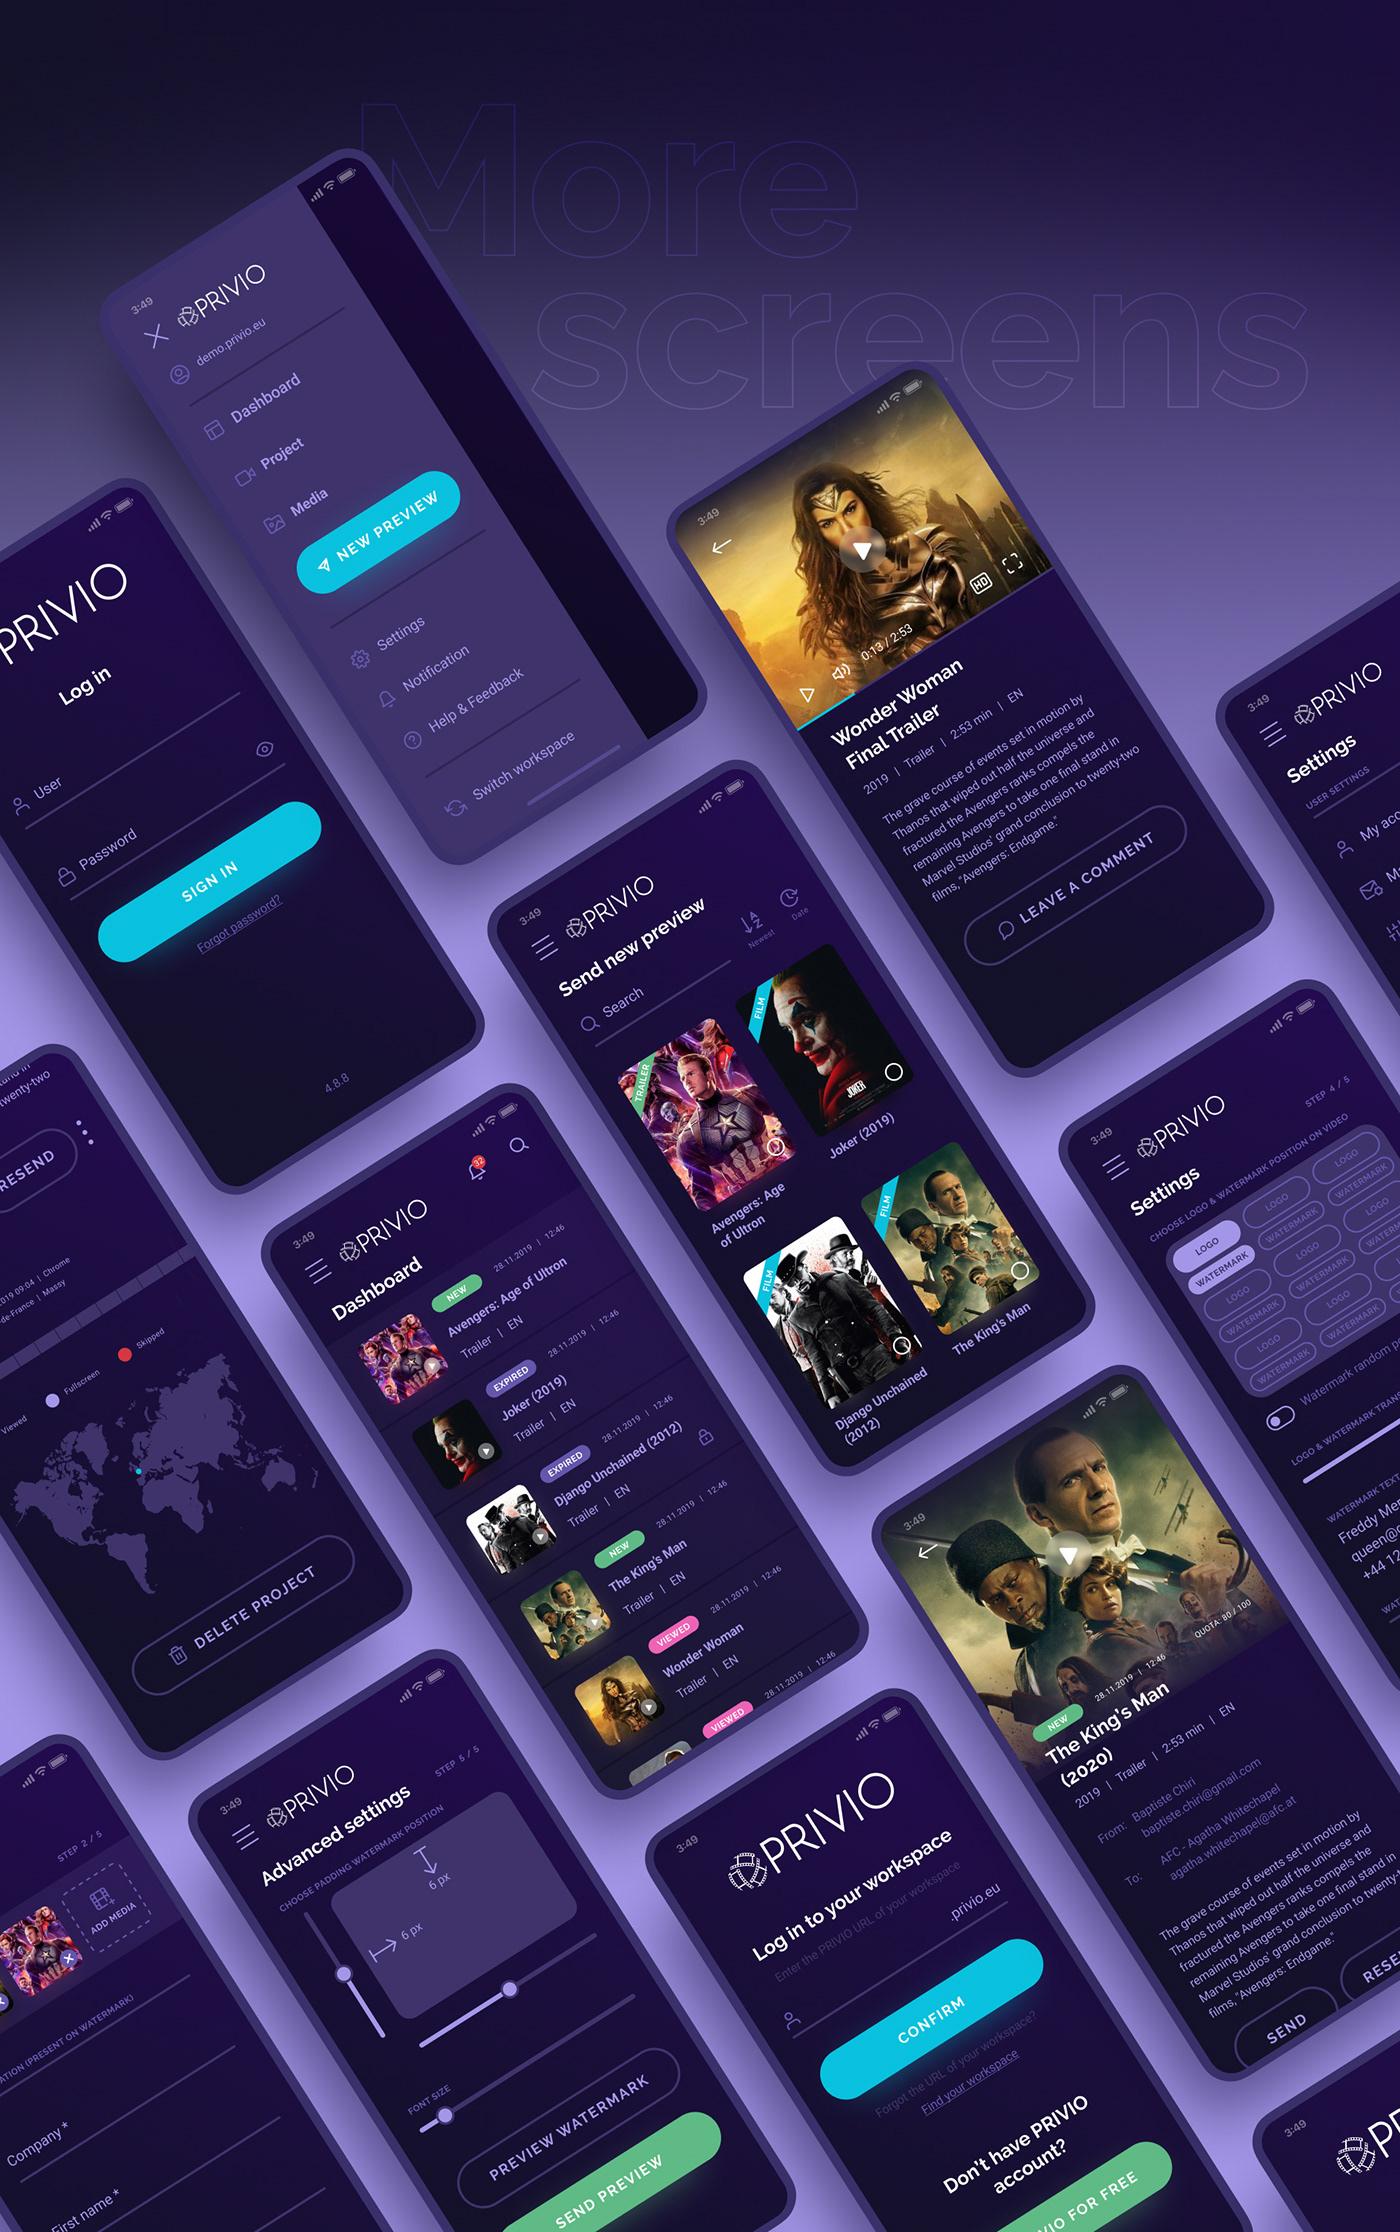 animation  app app design application product design  purple UI video app Mobile app UI/UX